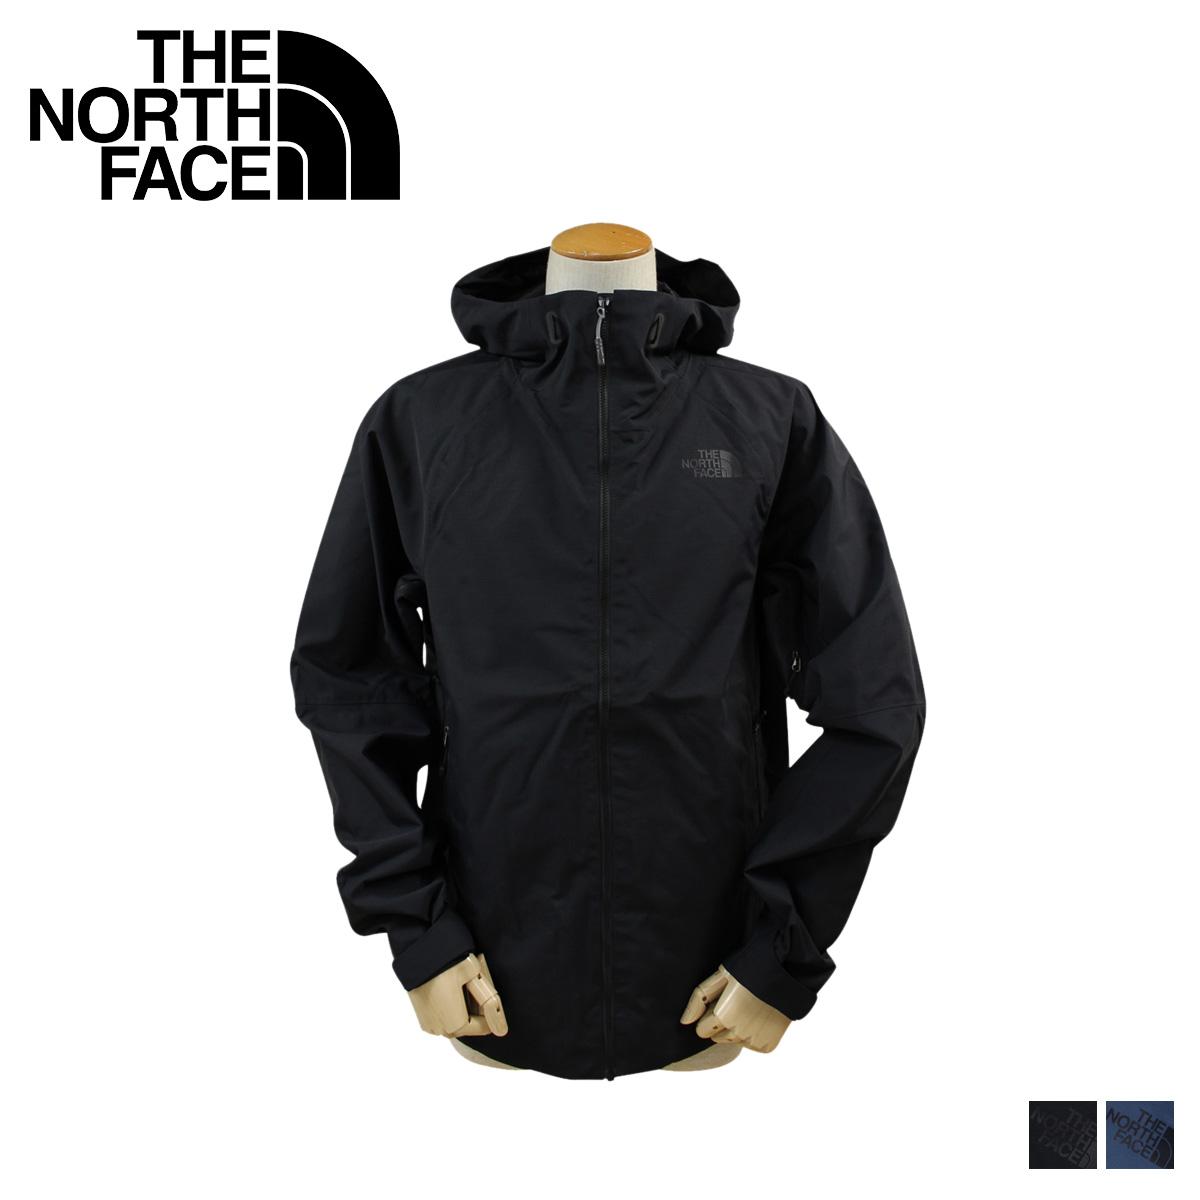 ALLSPORTS   Rakuten Global Market: THE NORTH FACE the north face ...